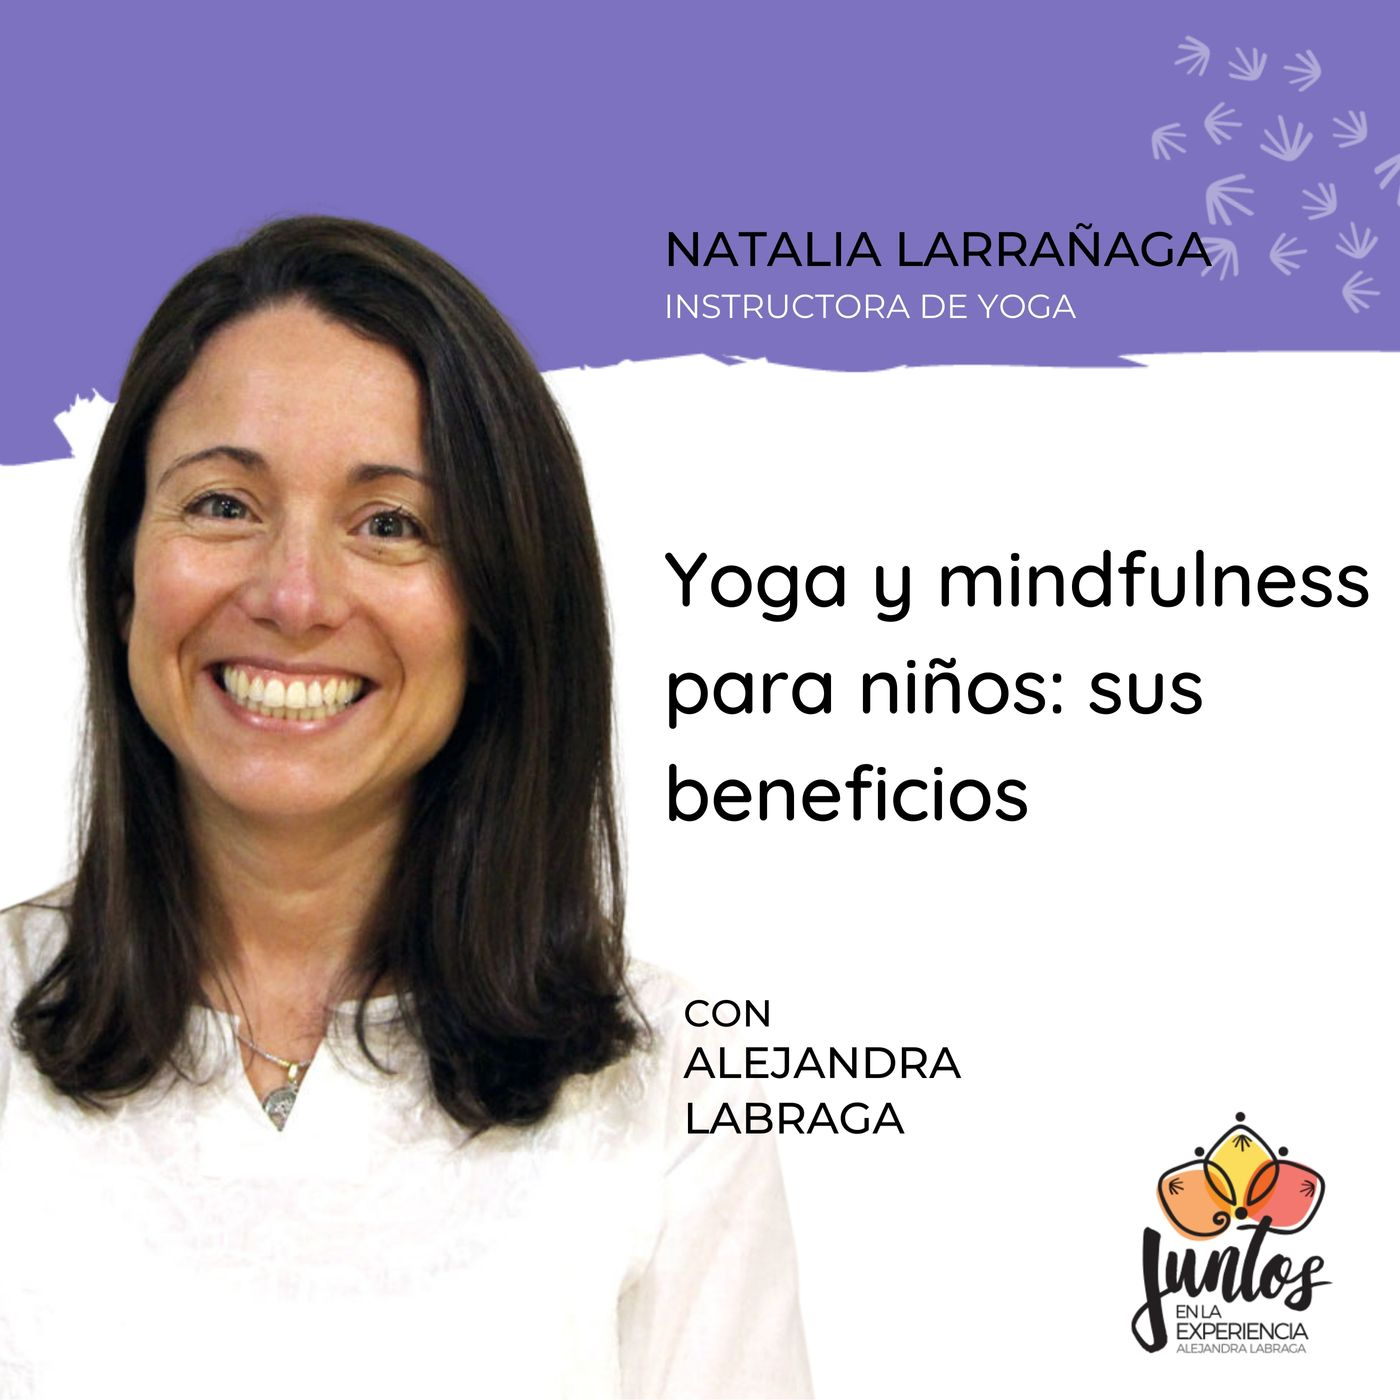 Ep. 089 - Yoga y Mindfulness para niños con Natalia Larrañaga